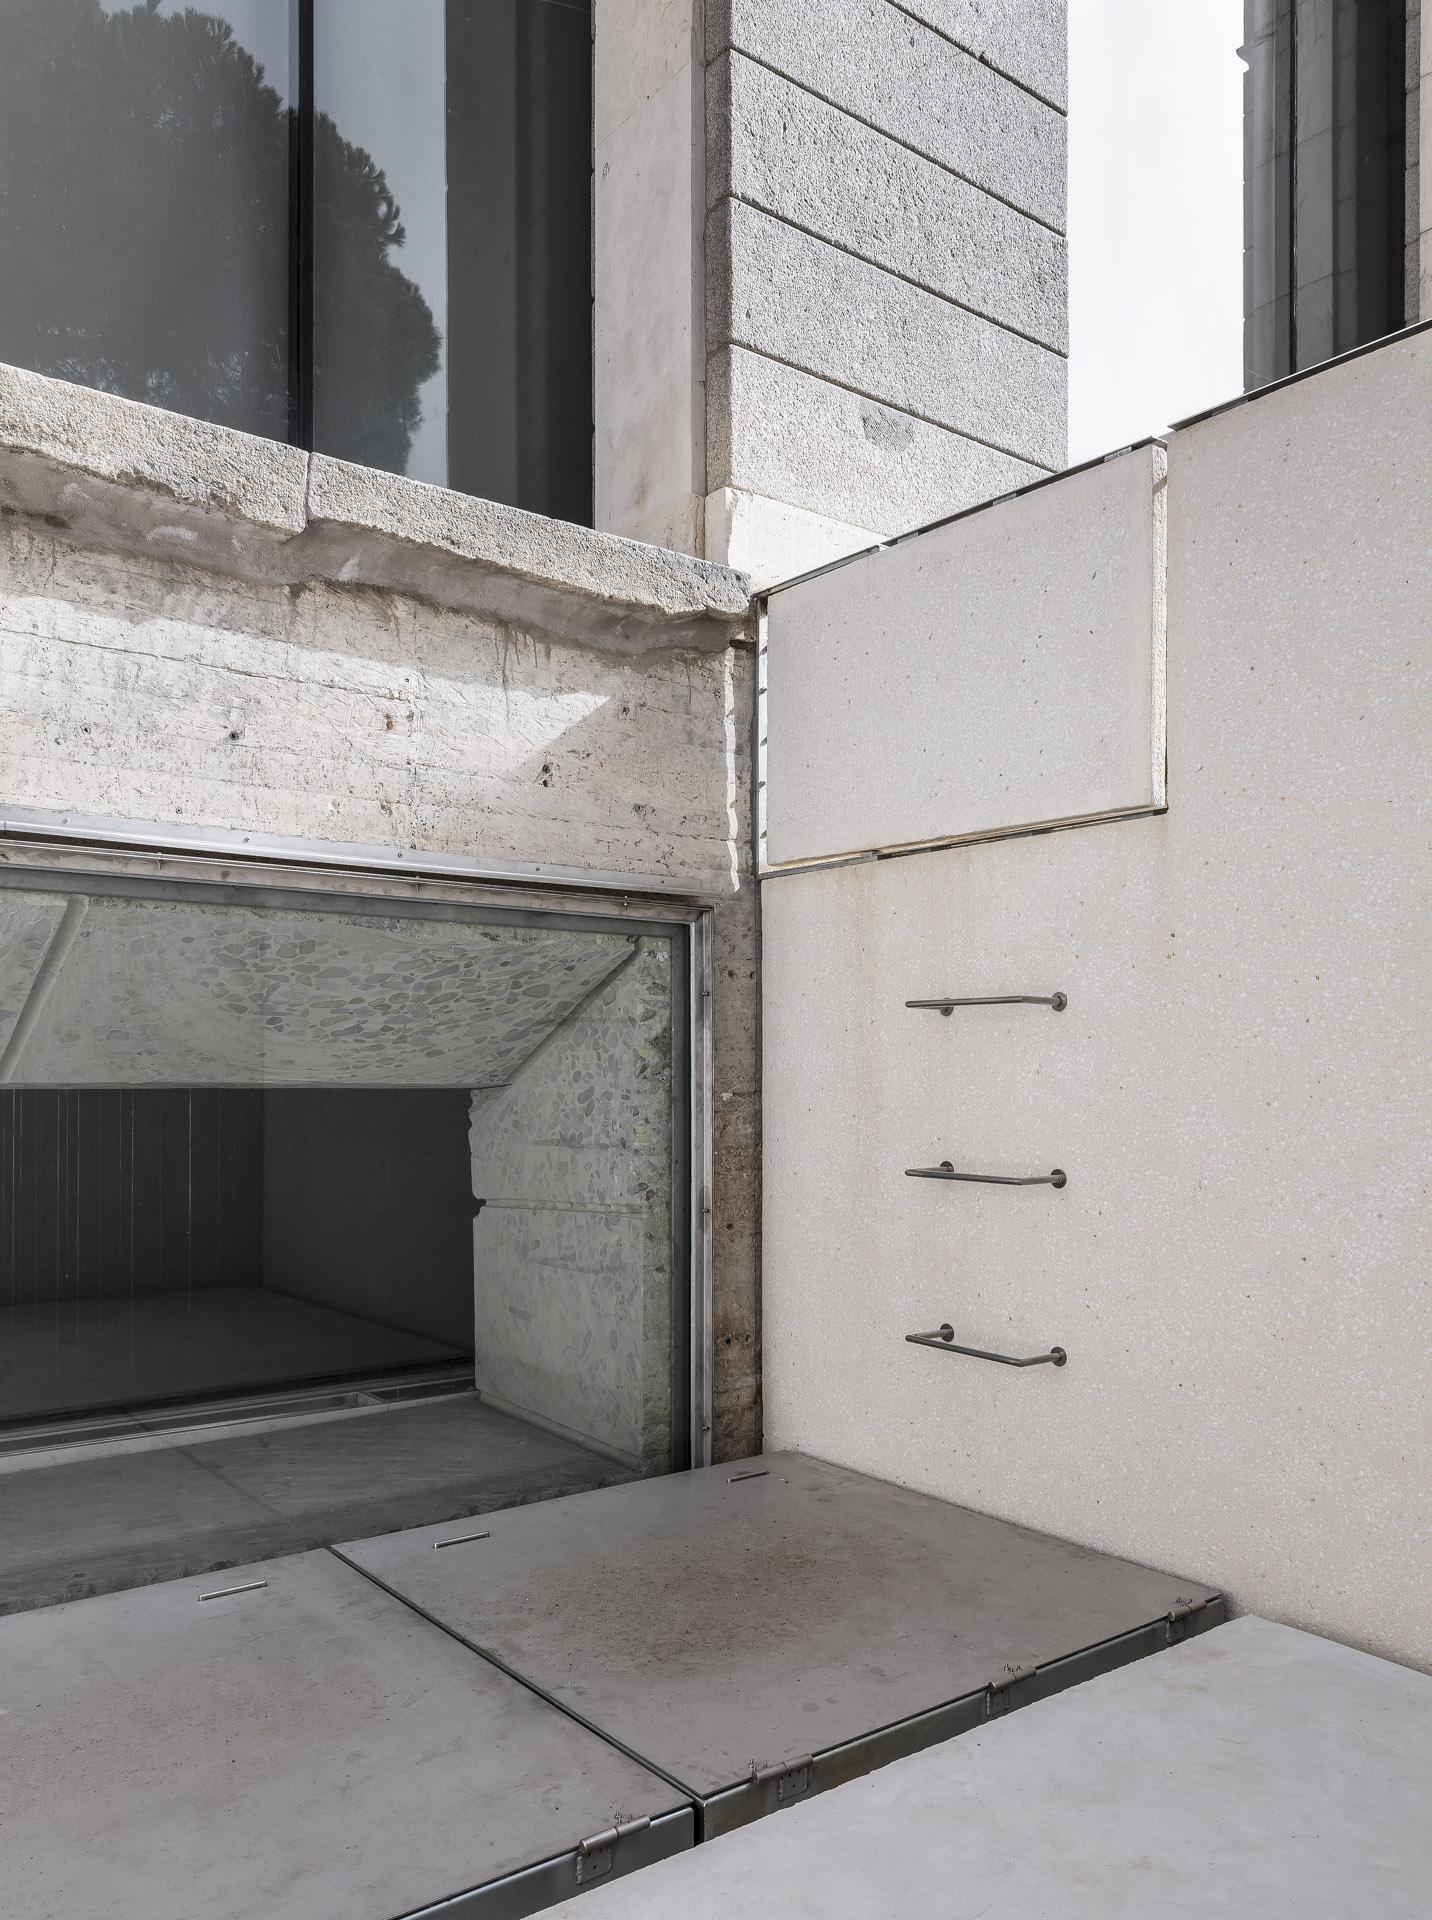 fotografia-arquitectura-madrid-nuevos-ministerios-elorza-german-cabo-07